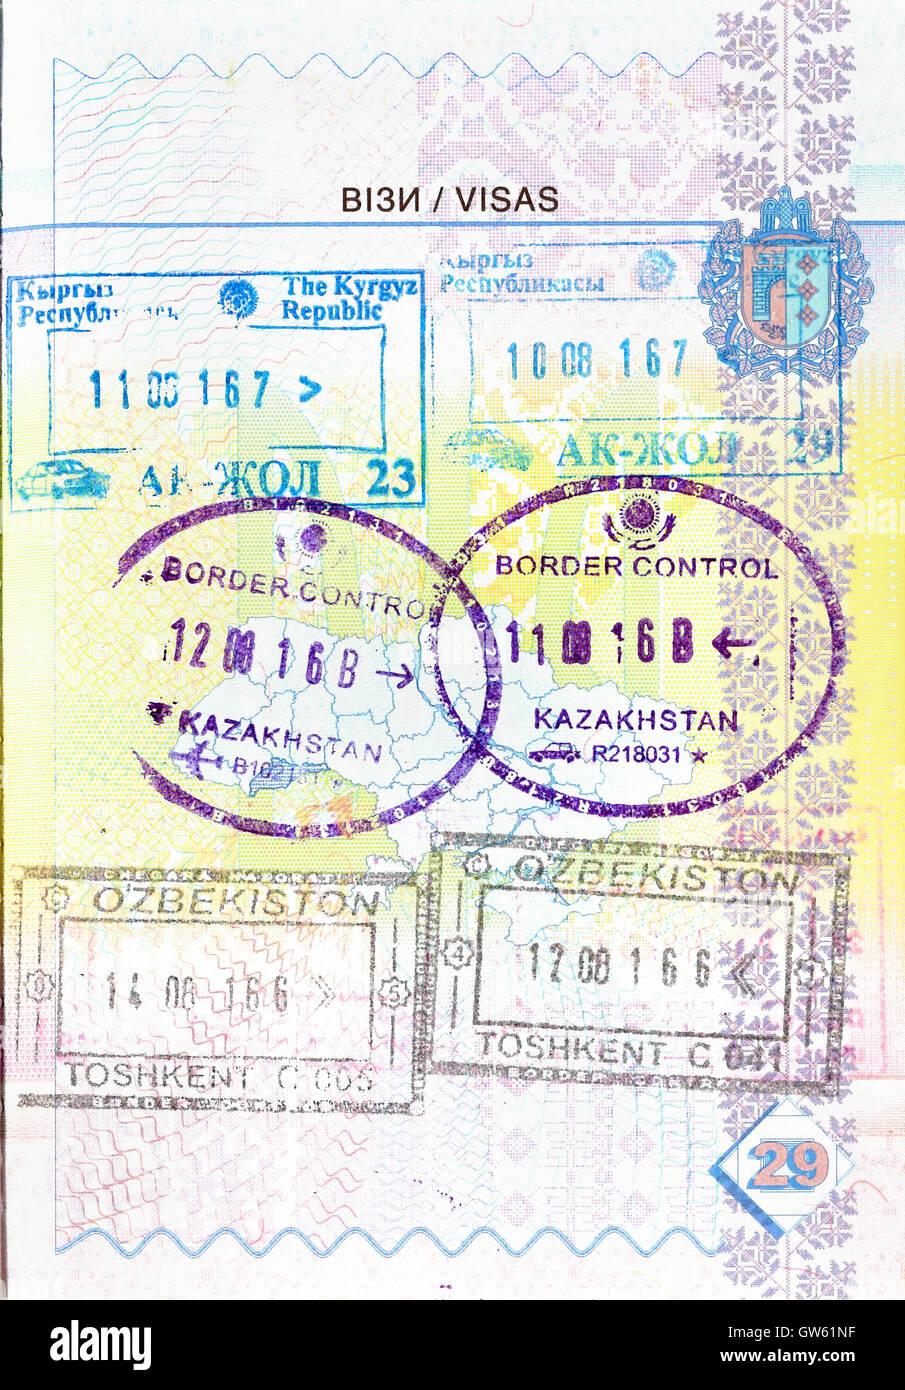 Passport Stamps Europe Stock Photos Amp Passport Stamps